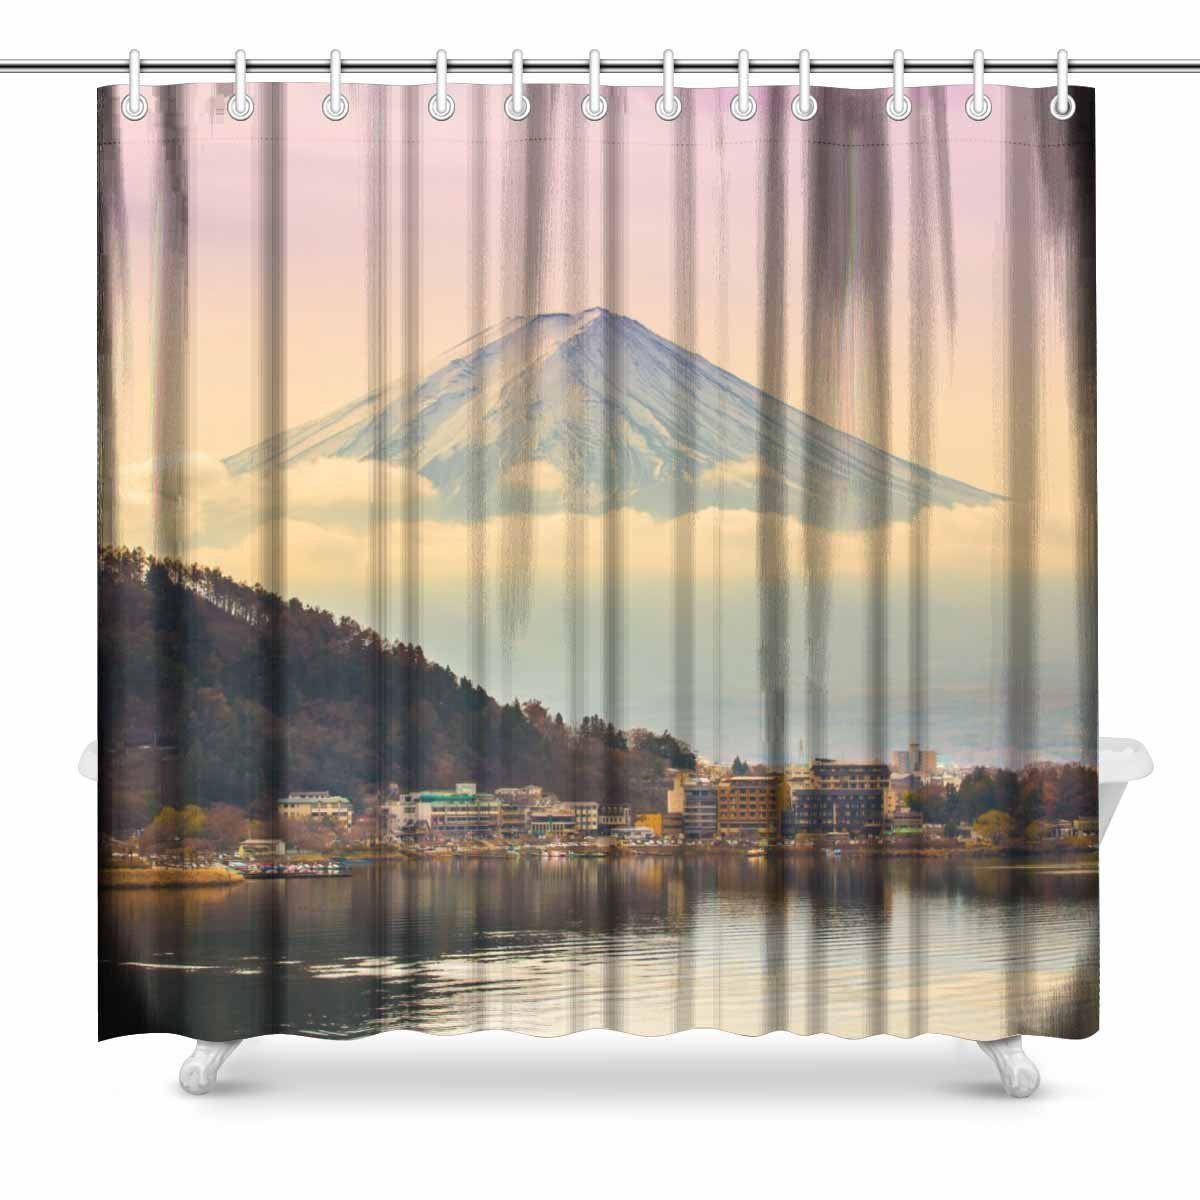 2019 Aplysia Mount Fuji At Kawakuchiko Lake In Japan Fabric Bathroom Shower Curtain Decor Set With Hooks 72 X Inches From Huayama 3005